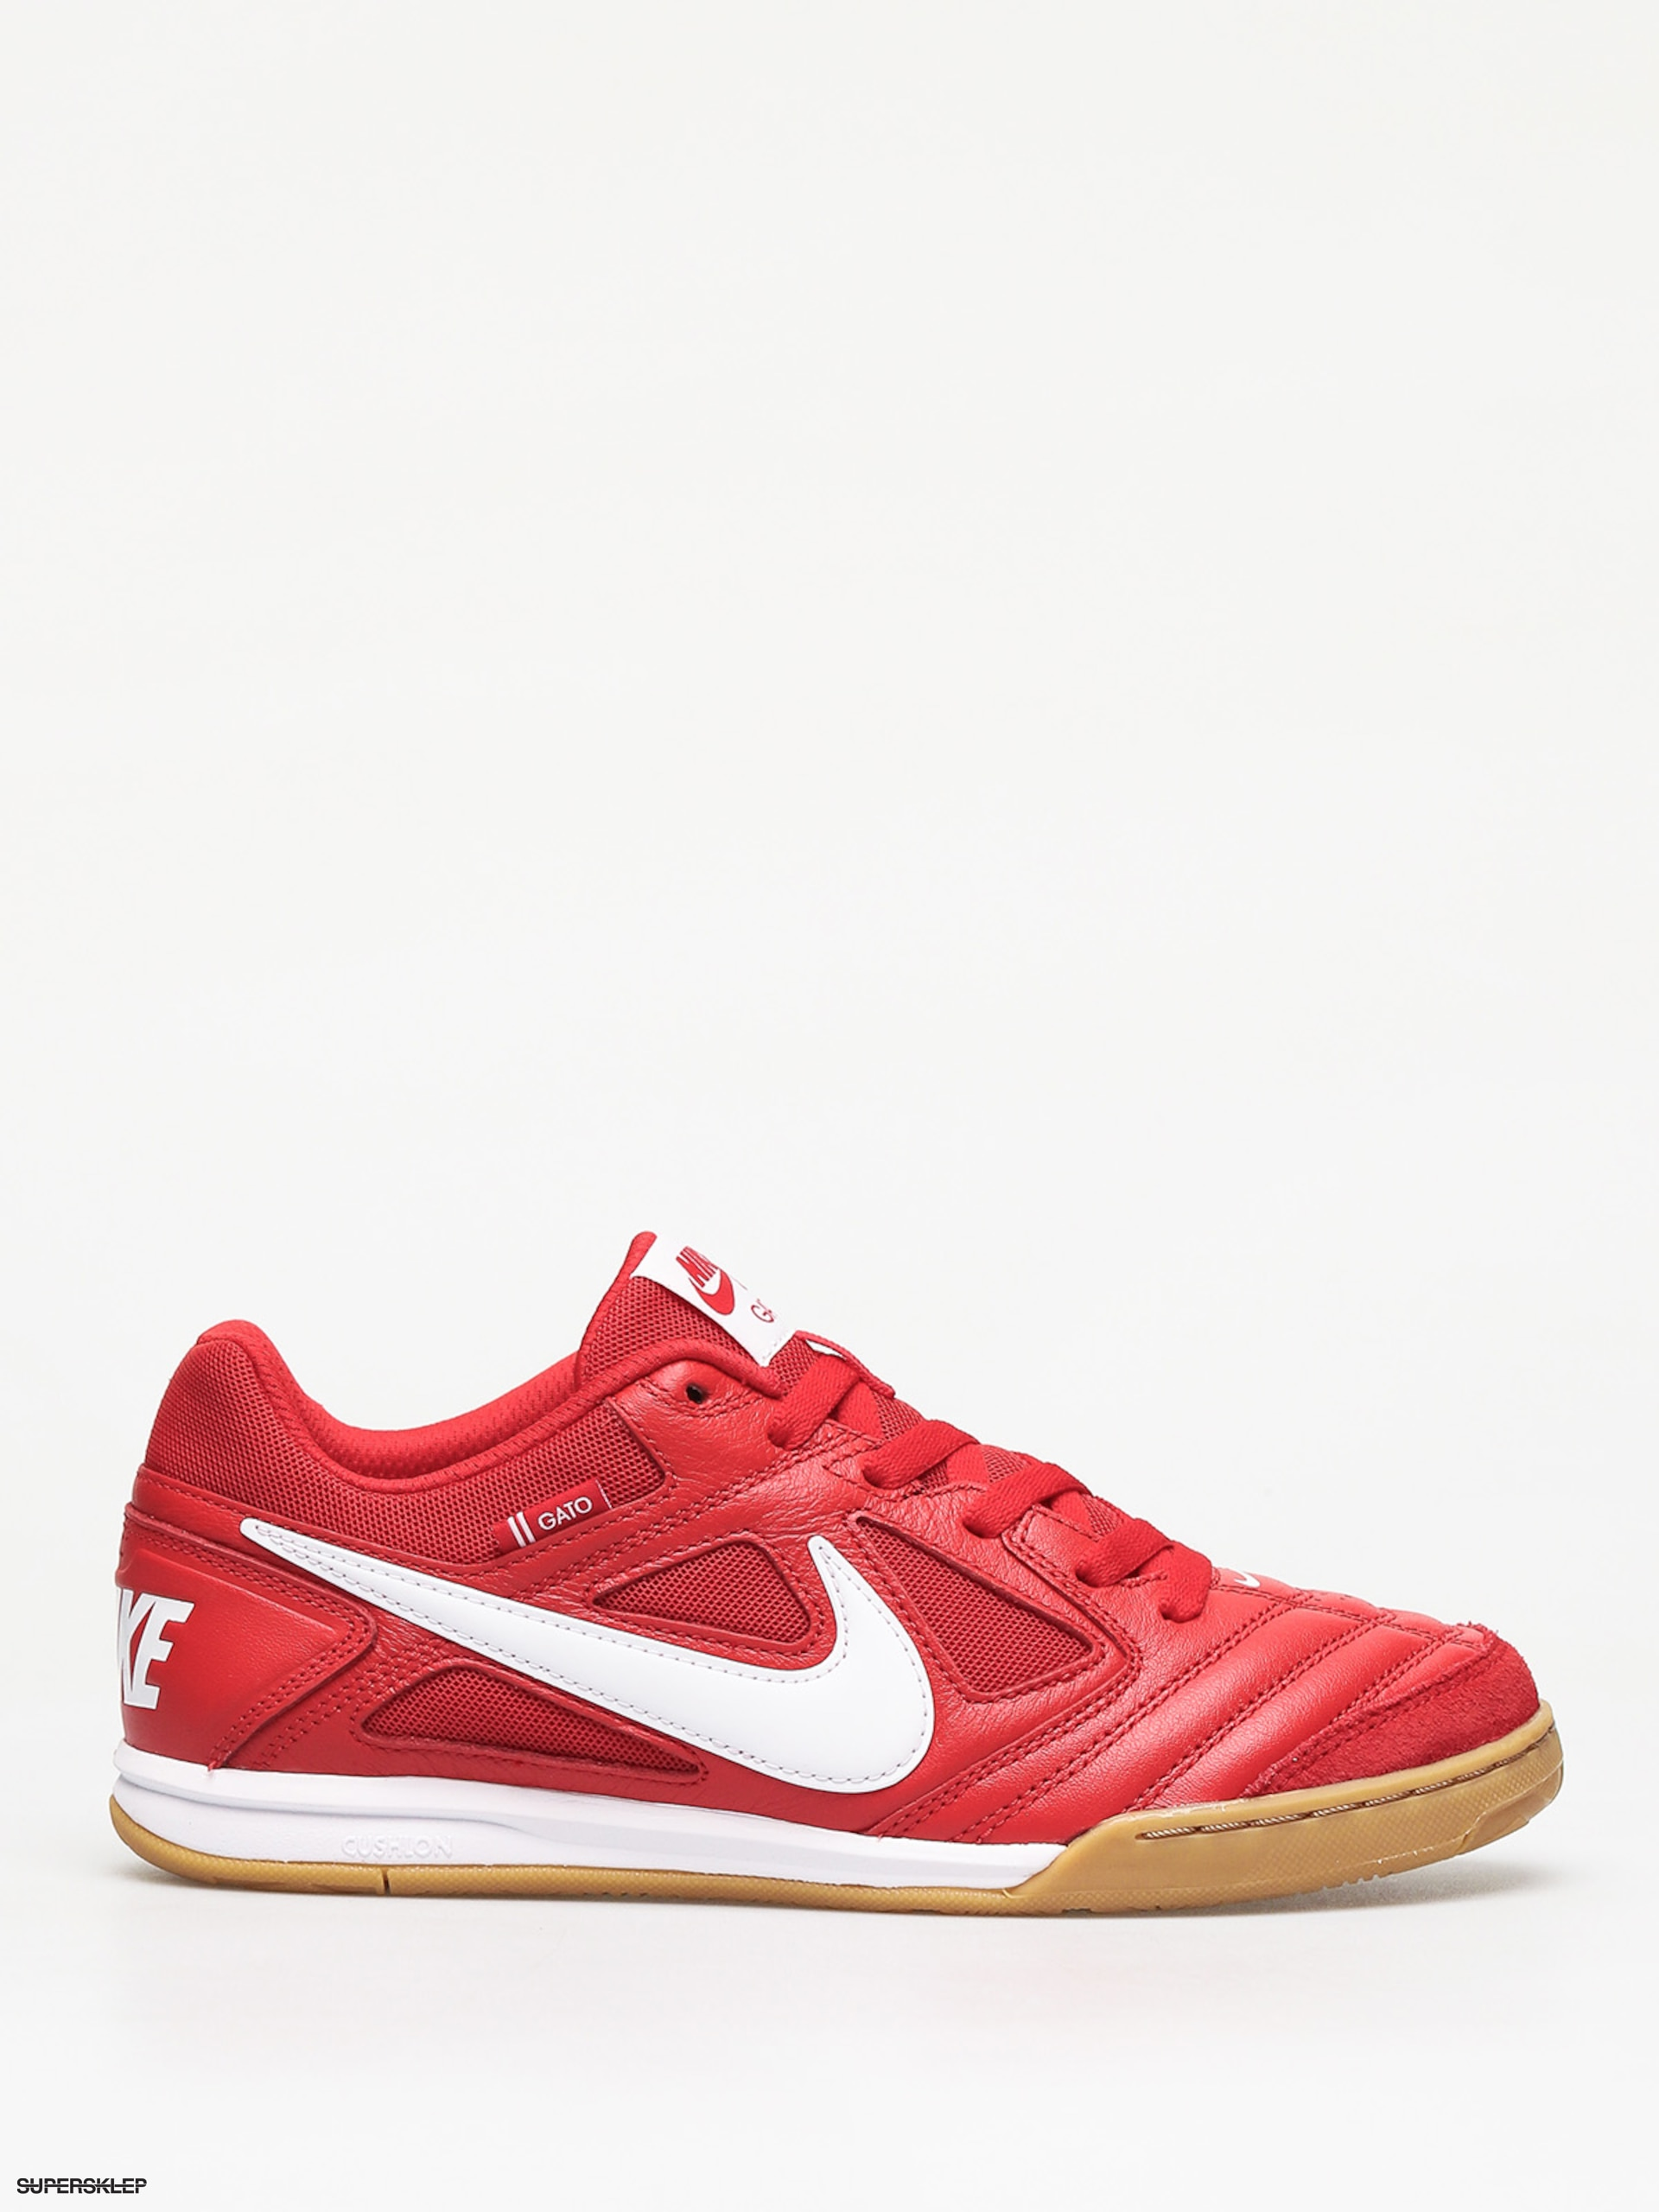 6c724af3c2e32 Topánky Nike SB Sb Gato (university red/white gum light brown)